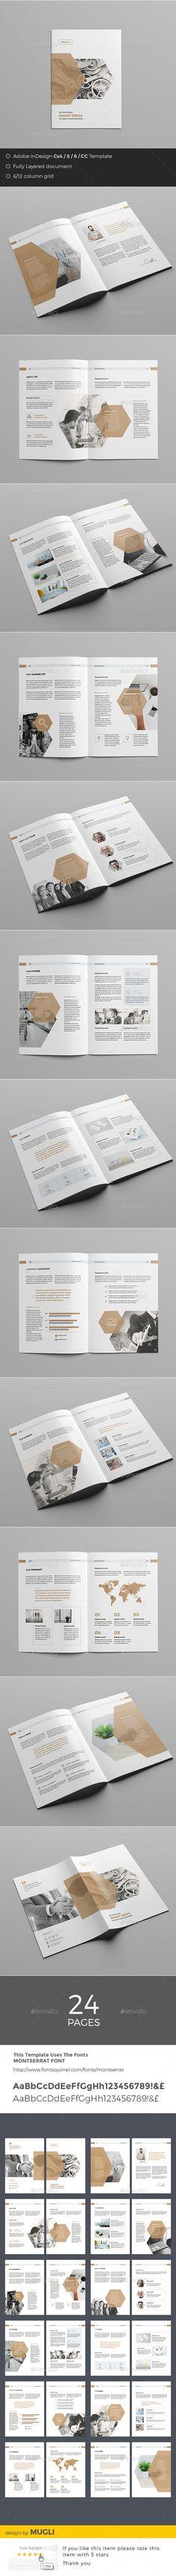 Business Brochure Template InDesign INDD. Download here: https://graphicriver.net/item/business-brochure/17375398?ref=ksioks